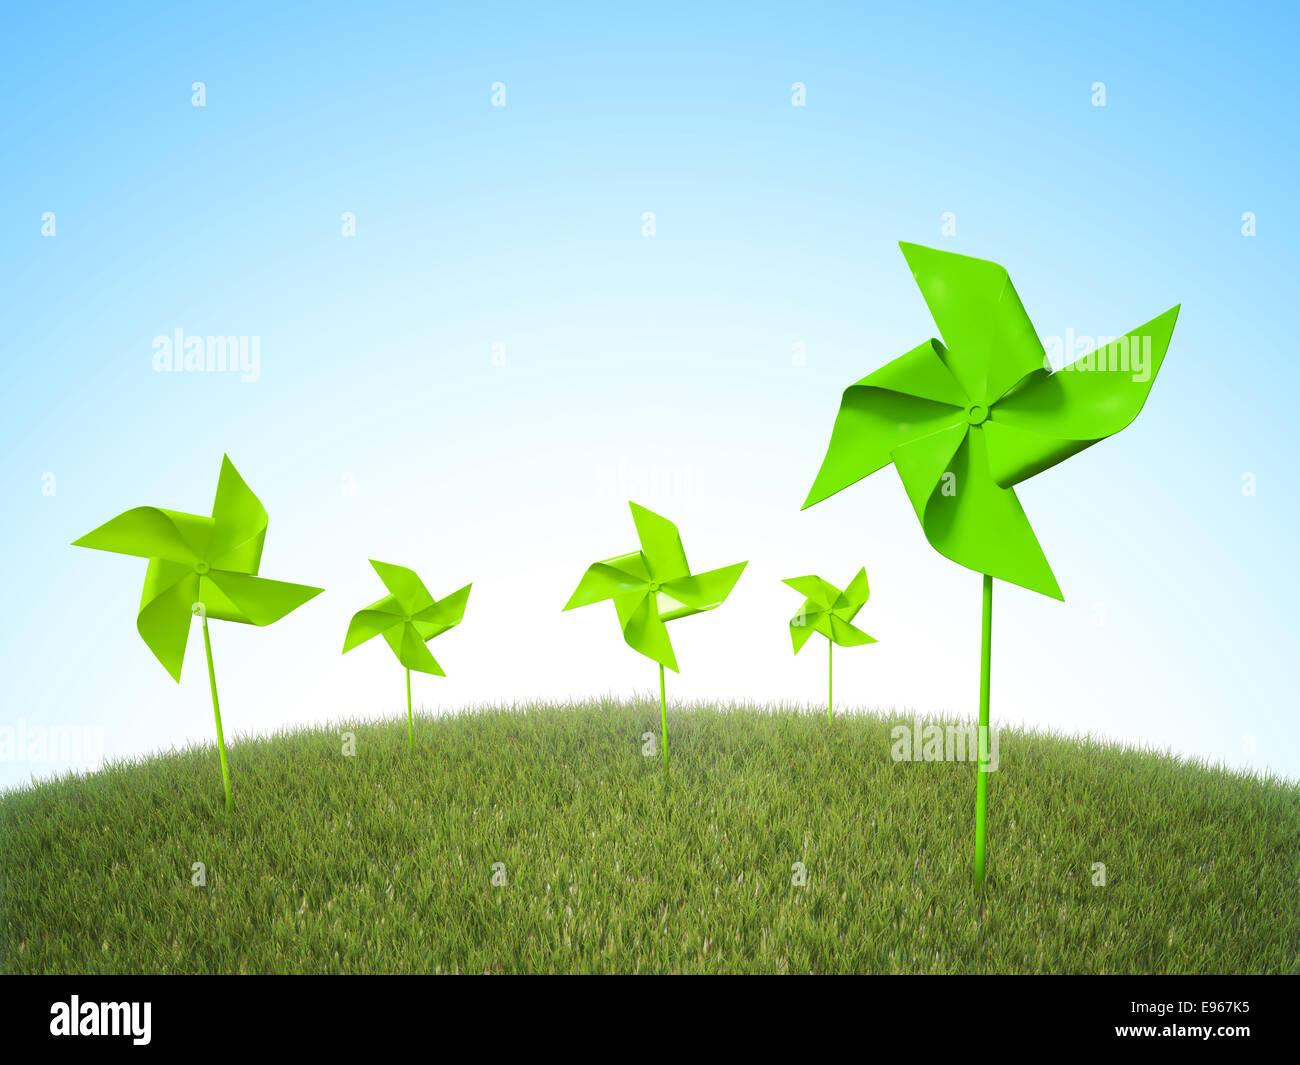 Windrad Windräder in einem Feld Gras - erneuerbare Energie-Konzept Stockbild